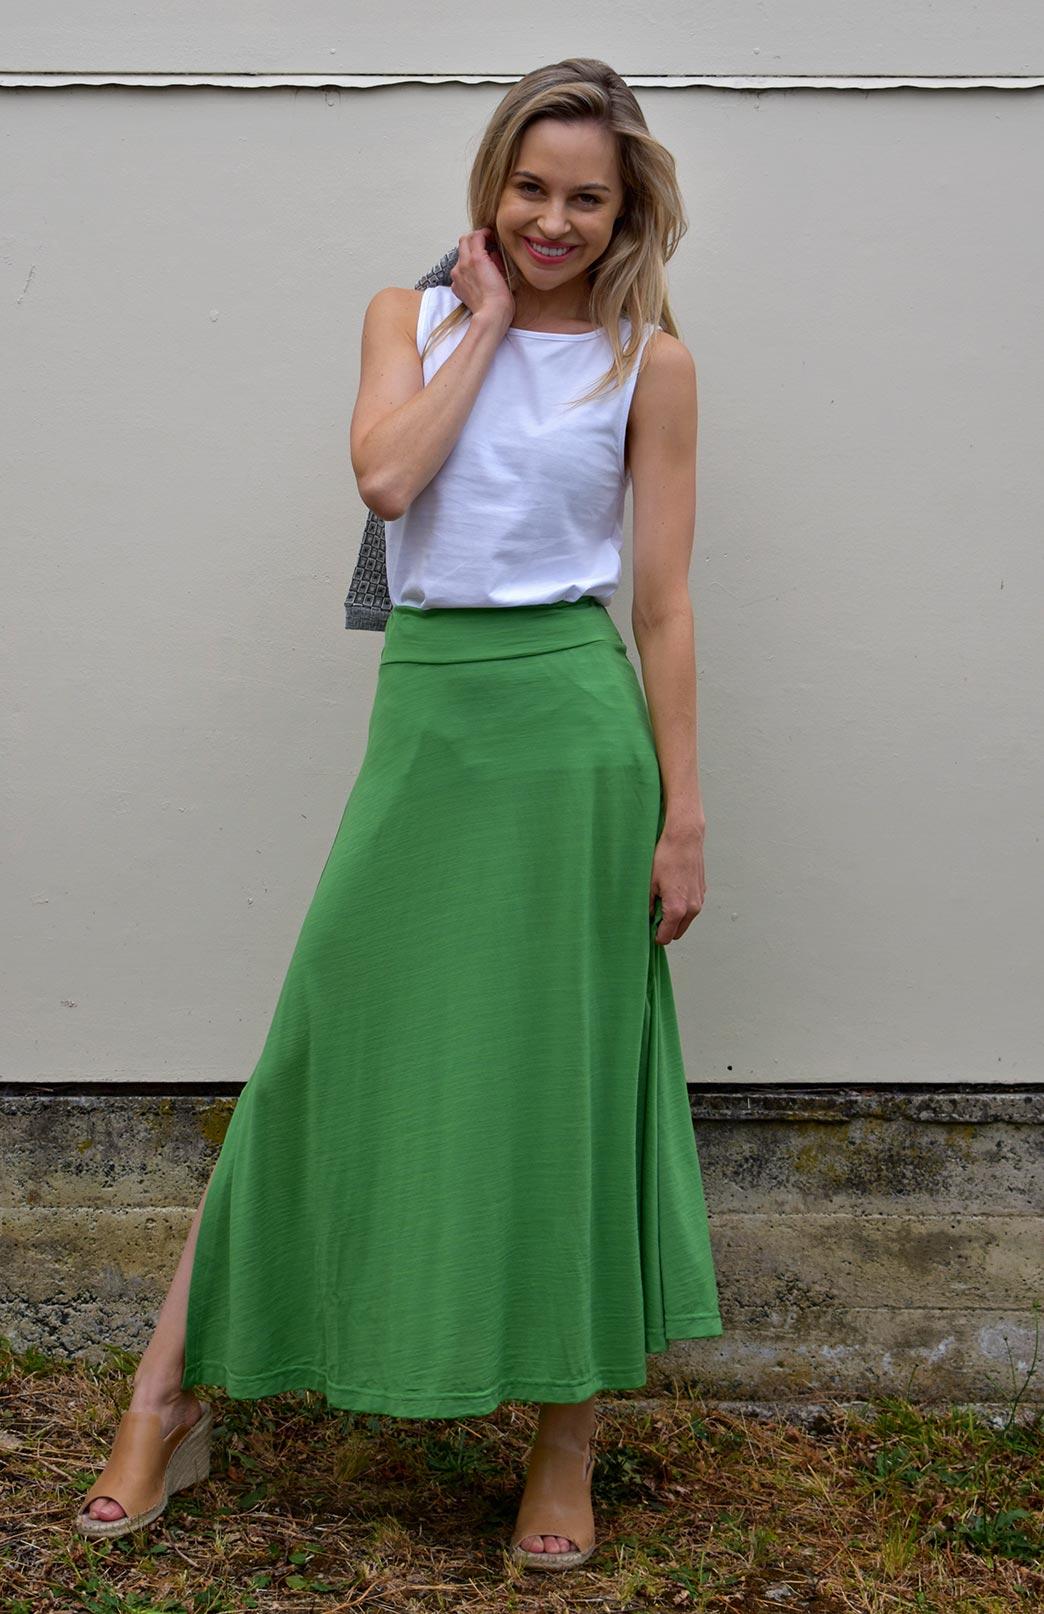 Marion Skirt - Women's Apple Green Merino Wool Maxi Skirt - Smitten Merino Tasmania Australia